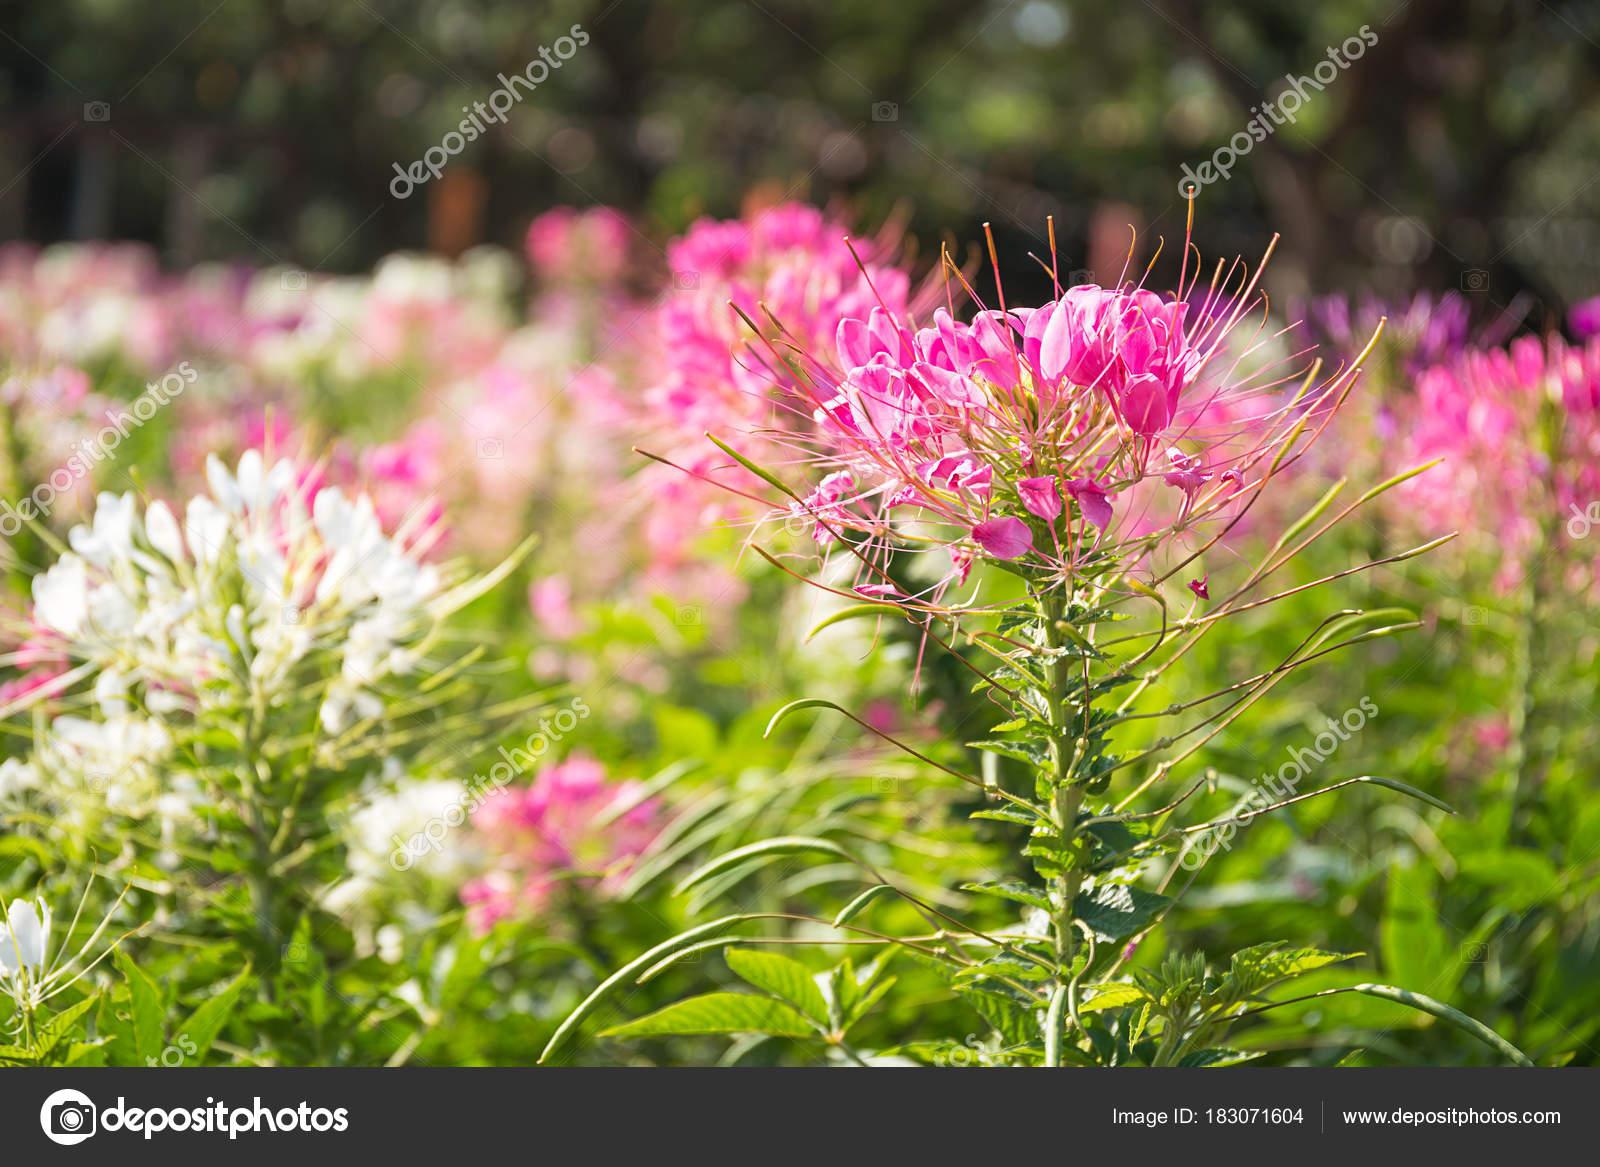 Pink And White Spider Flower In The Garden Stock Photo Stoonn